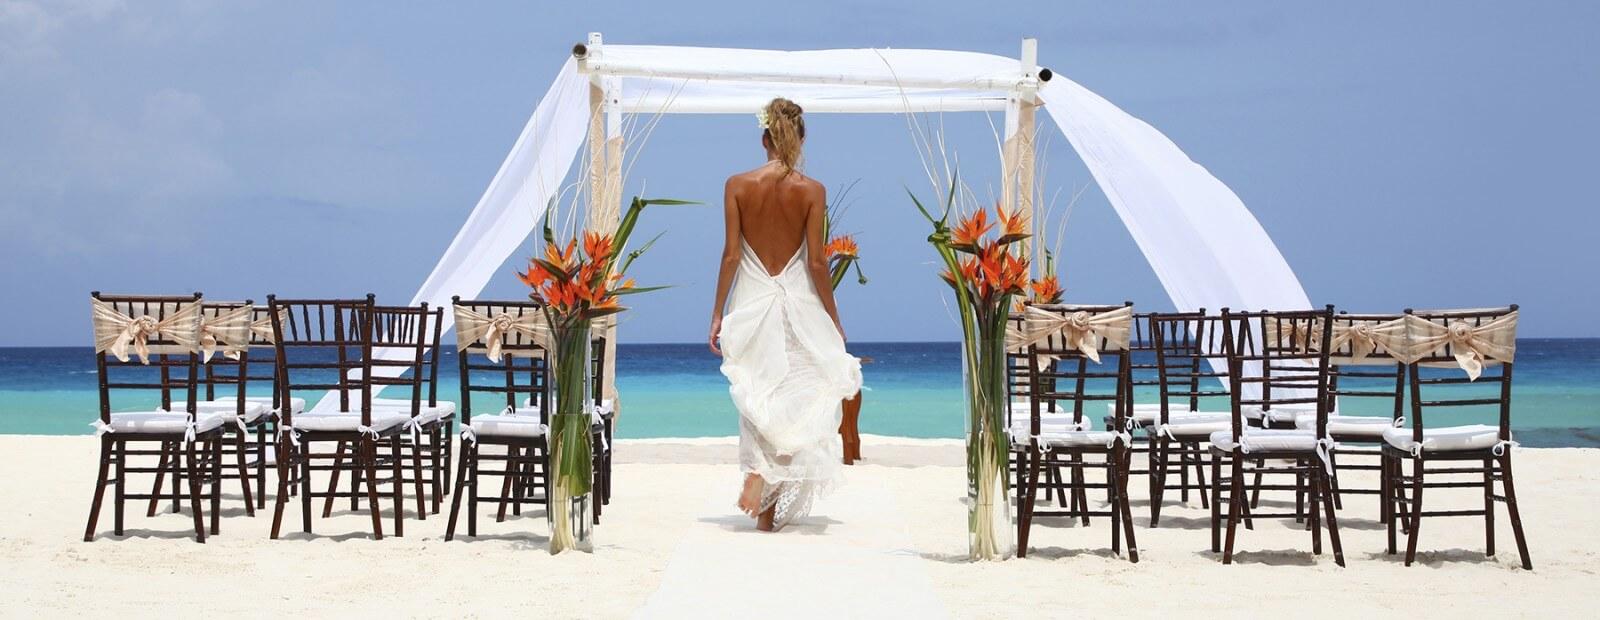 Sandos Hotels & Resorts Weddings